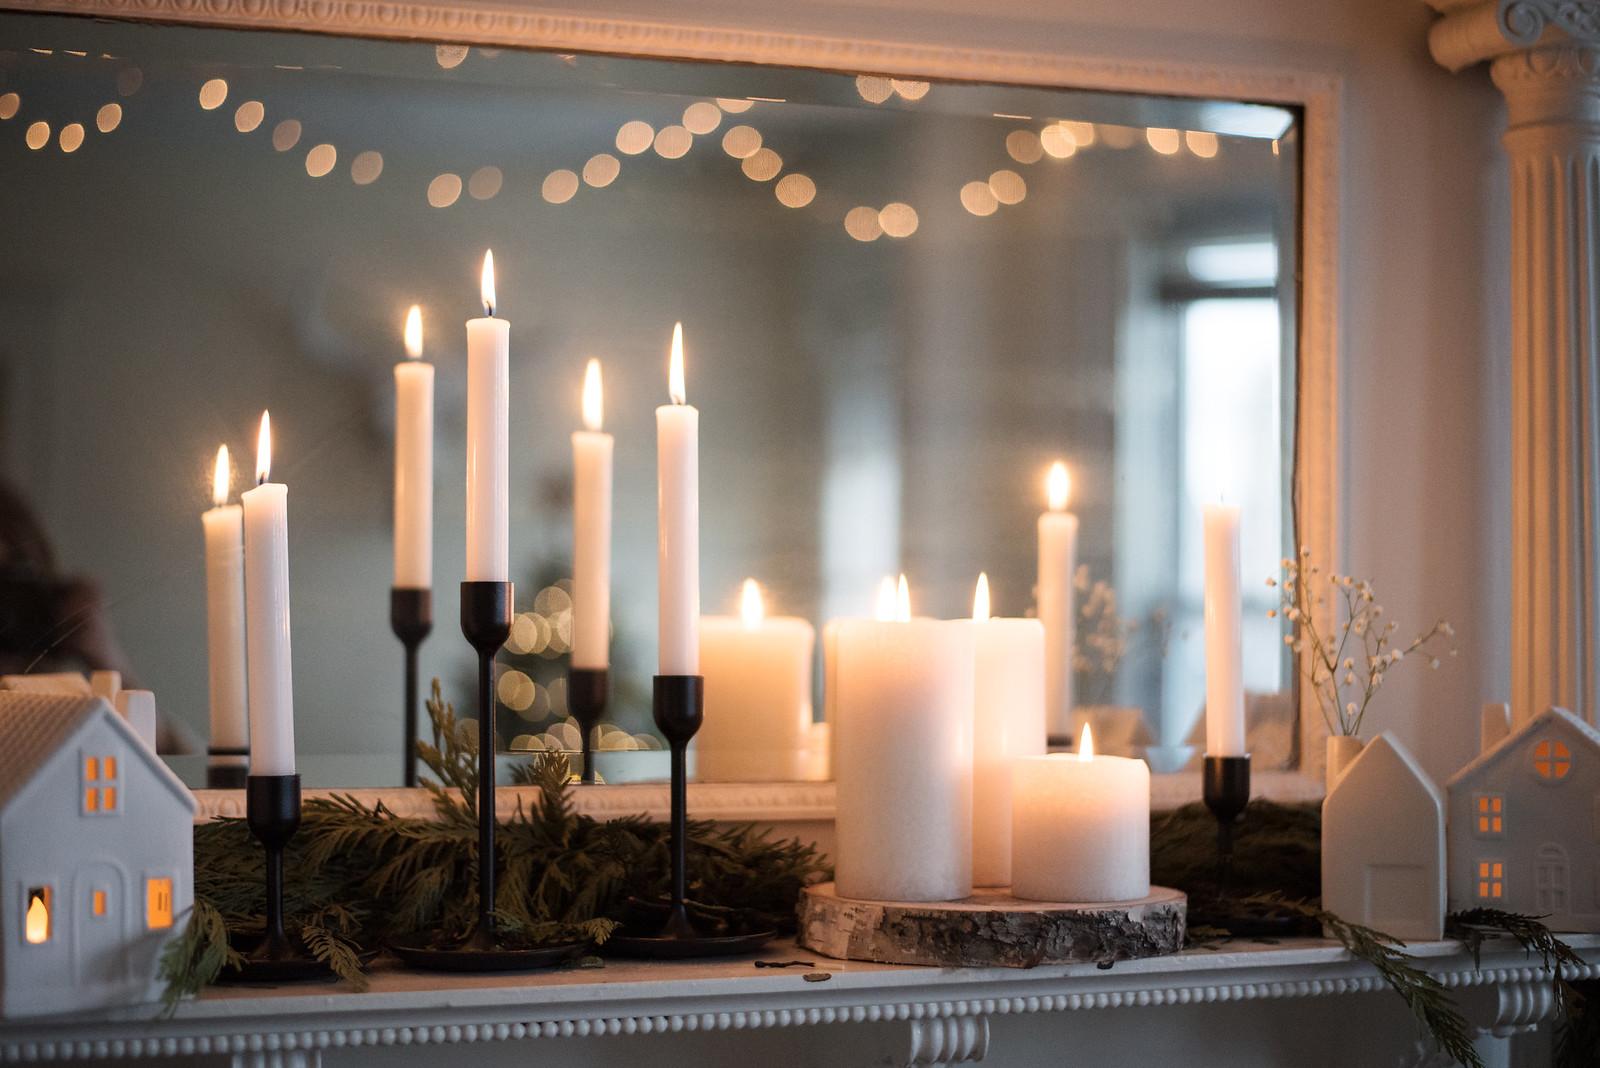 Candles and Greenery on juliettelaura.blogspot.com